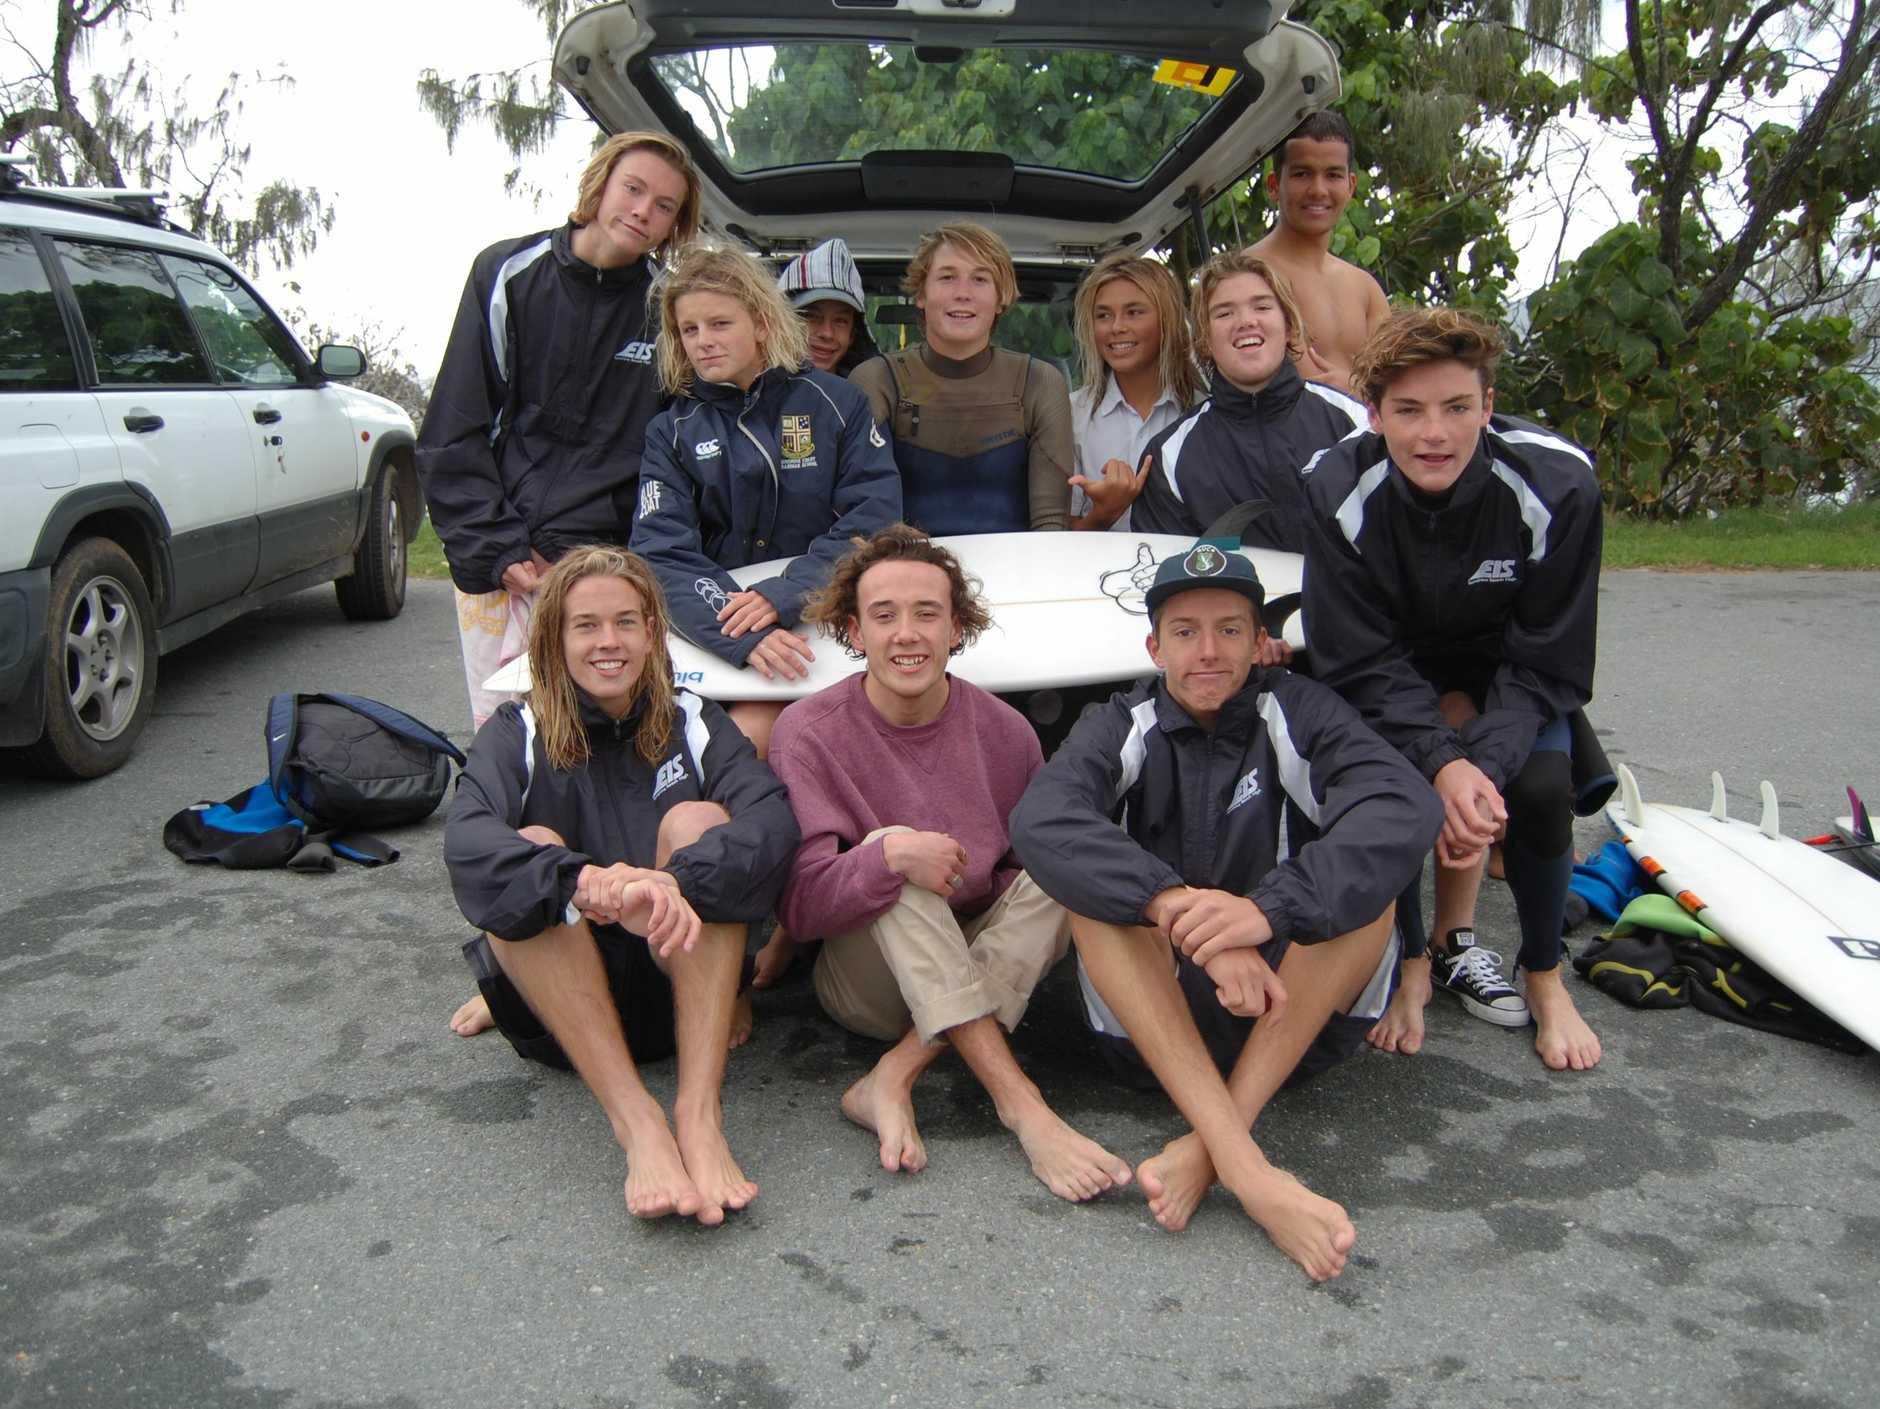 Sunshine Beach High Excellence in Surfing students (in no order) Callum Everson, Harper Bennell, Tyler Jeffs, Saxon Hansson, Buster Barton, Will Mappin, Miguel Neto, Hayden Roffaut, Josh Hardy, Schaulk van de Merwe, and Oscar O'Connell.